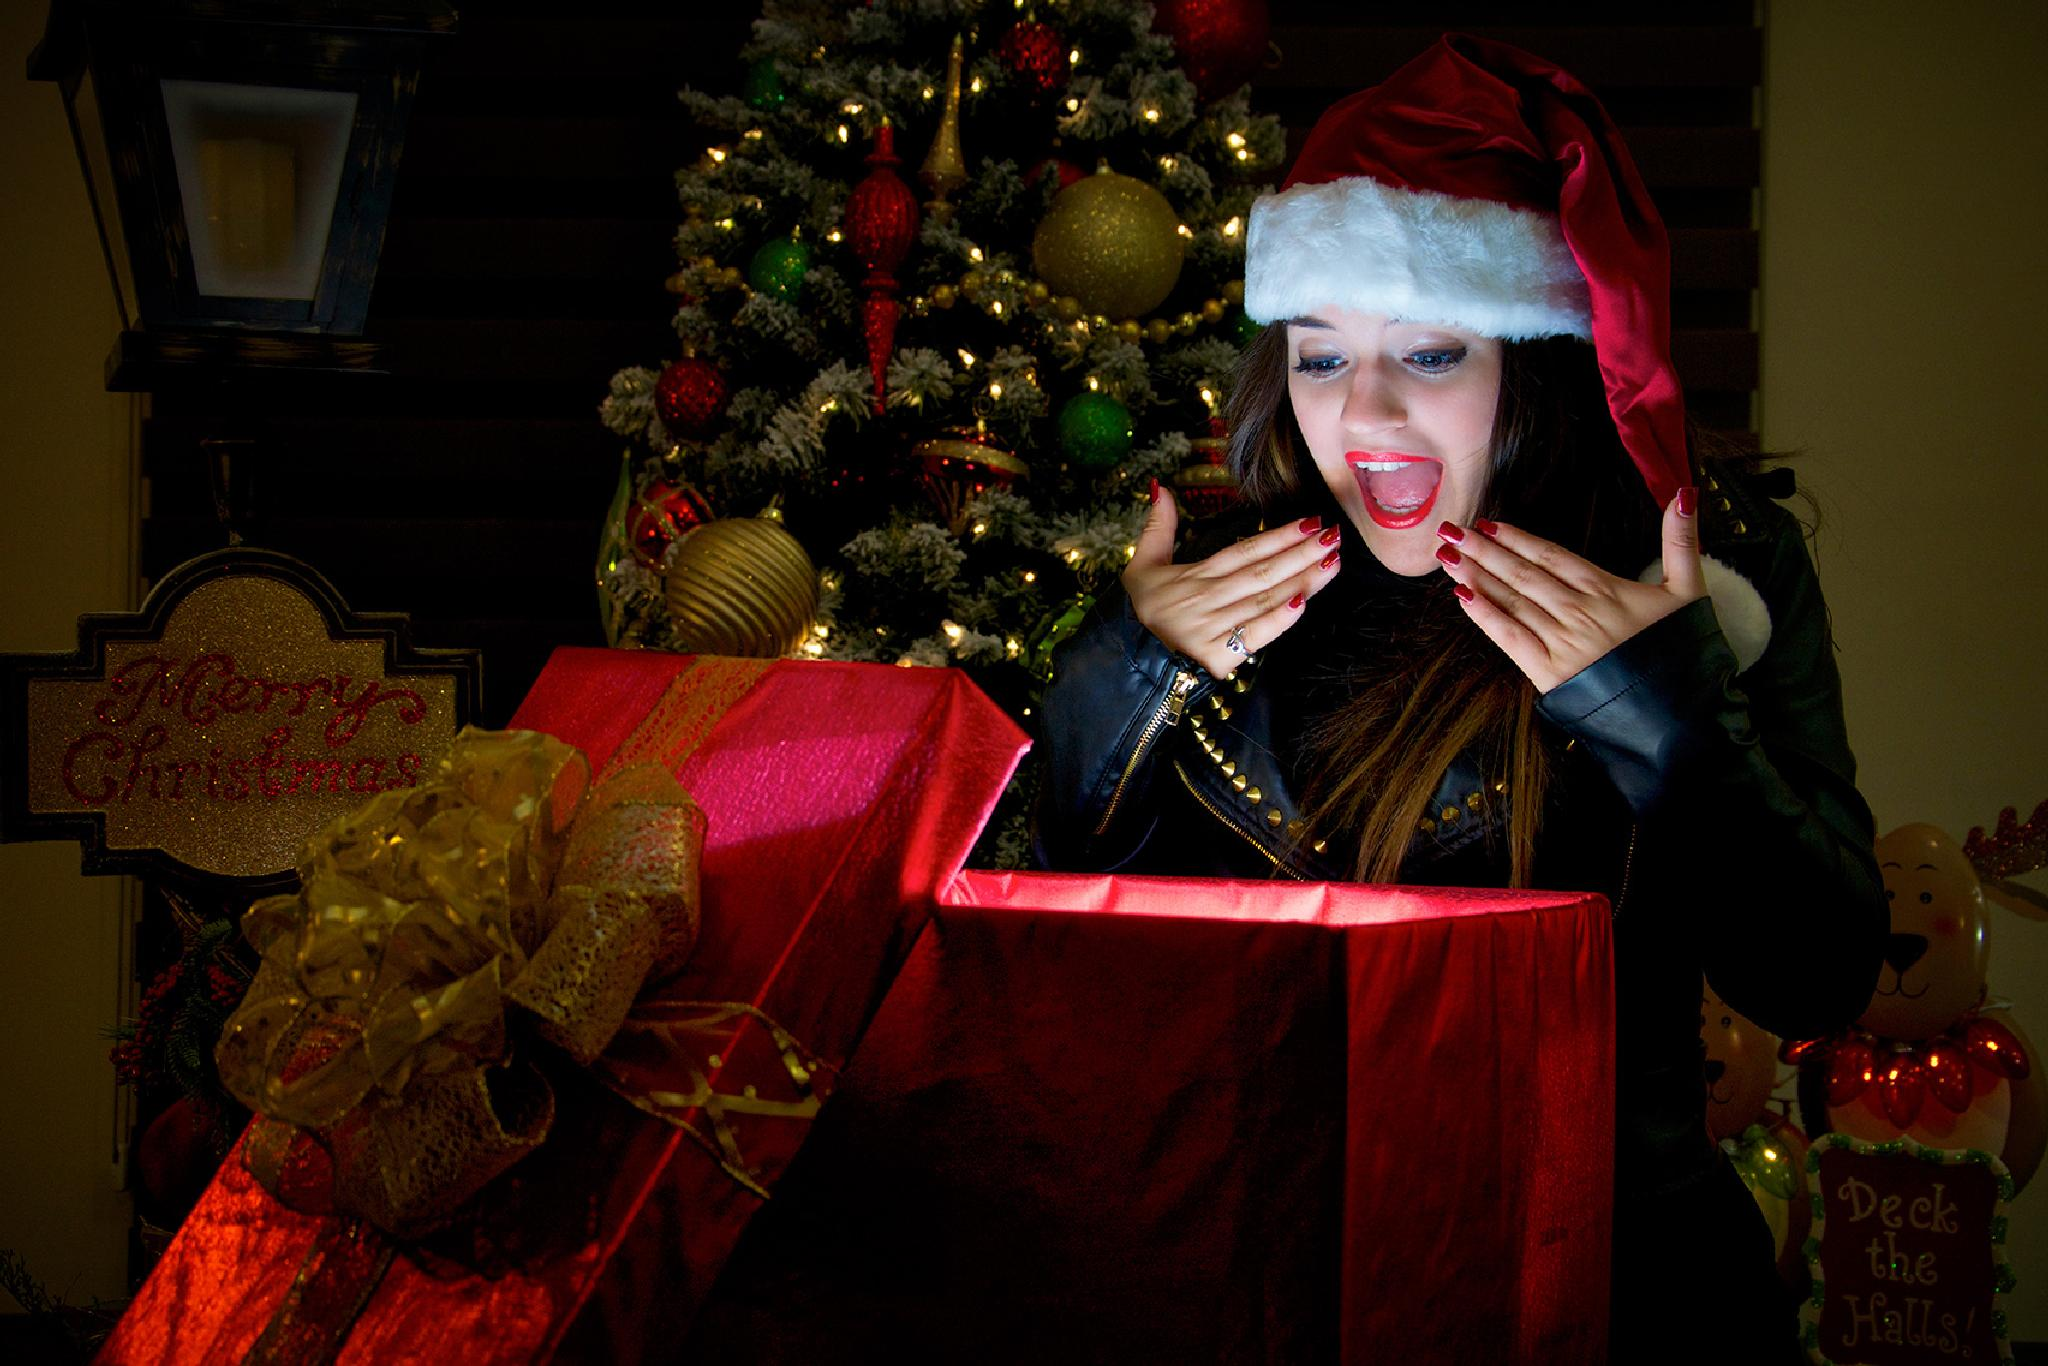 Surprise on Christmas by Jesús Leal Vallejo